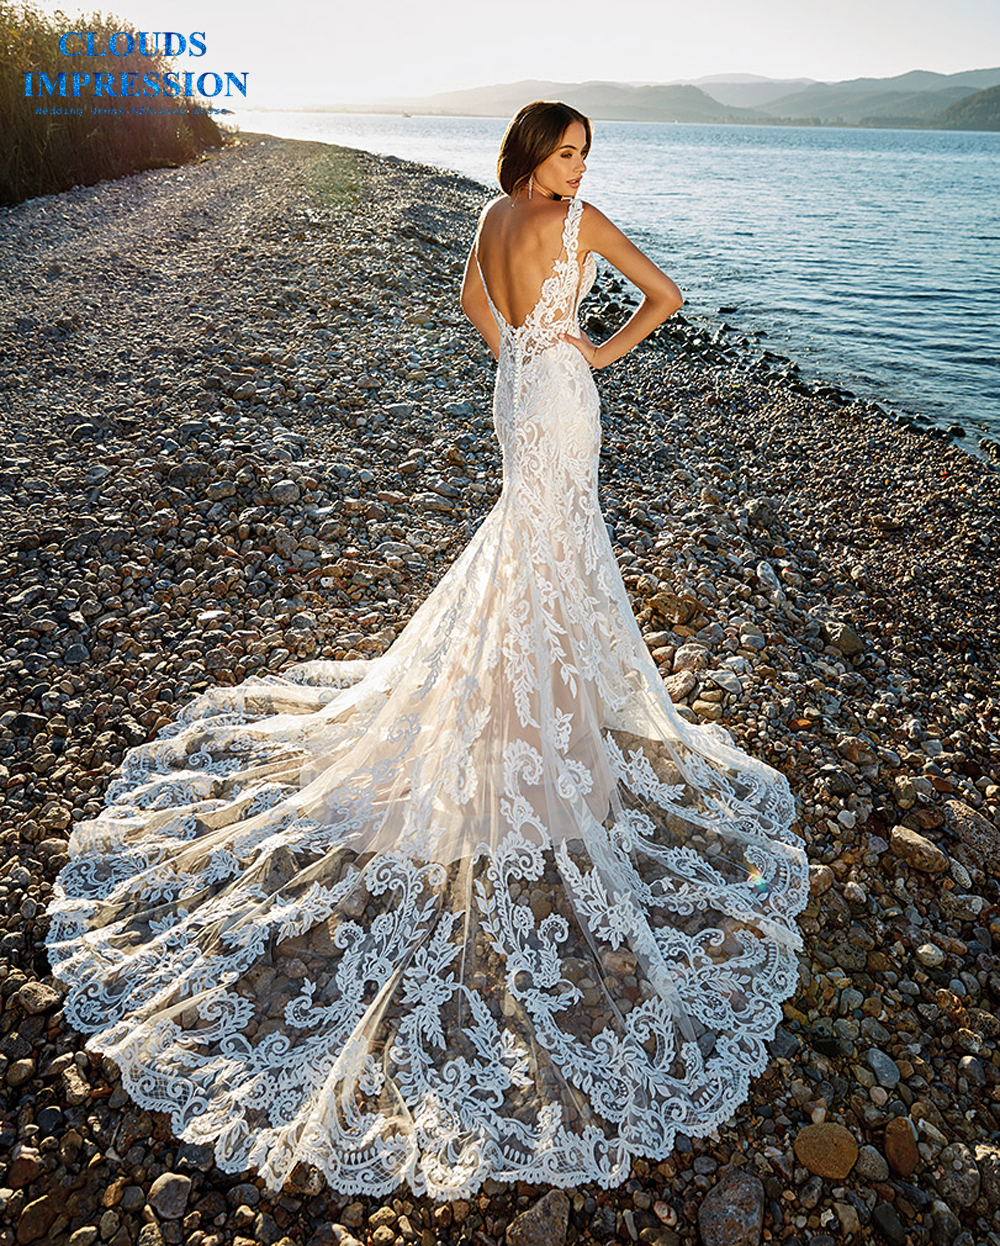 CLOUDS IMPRESSION Romantic Chapel Train Mermaid Wedding Dress 2019 V neck Beading Beach Lace Bride Dress Vestige De Noiva-in Wedding Dresses from Weddings & Events    1